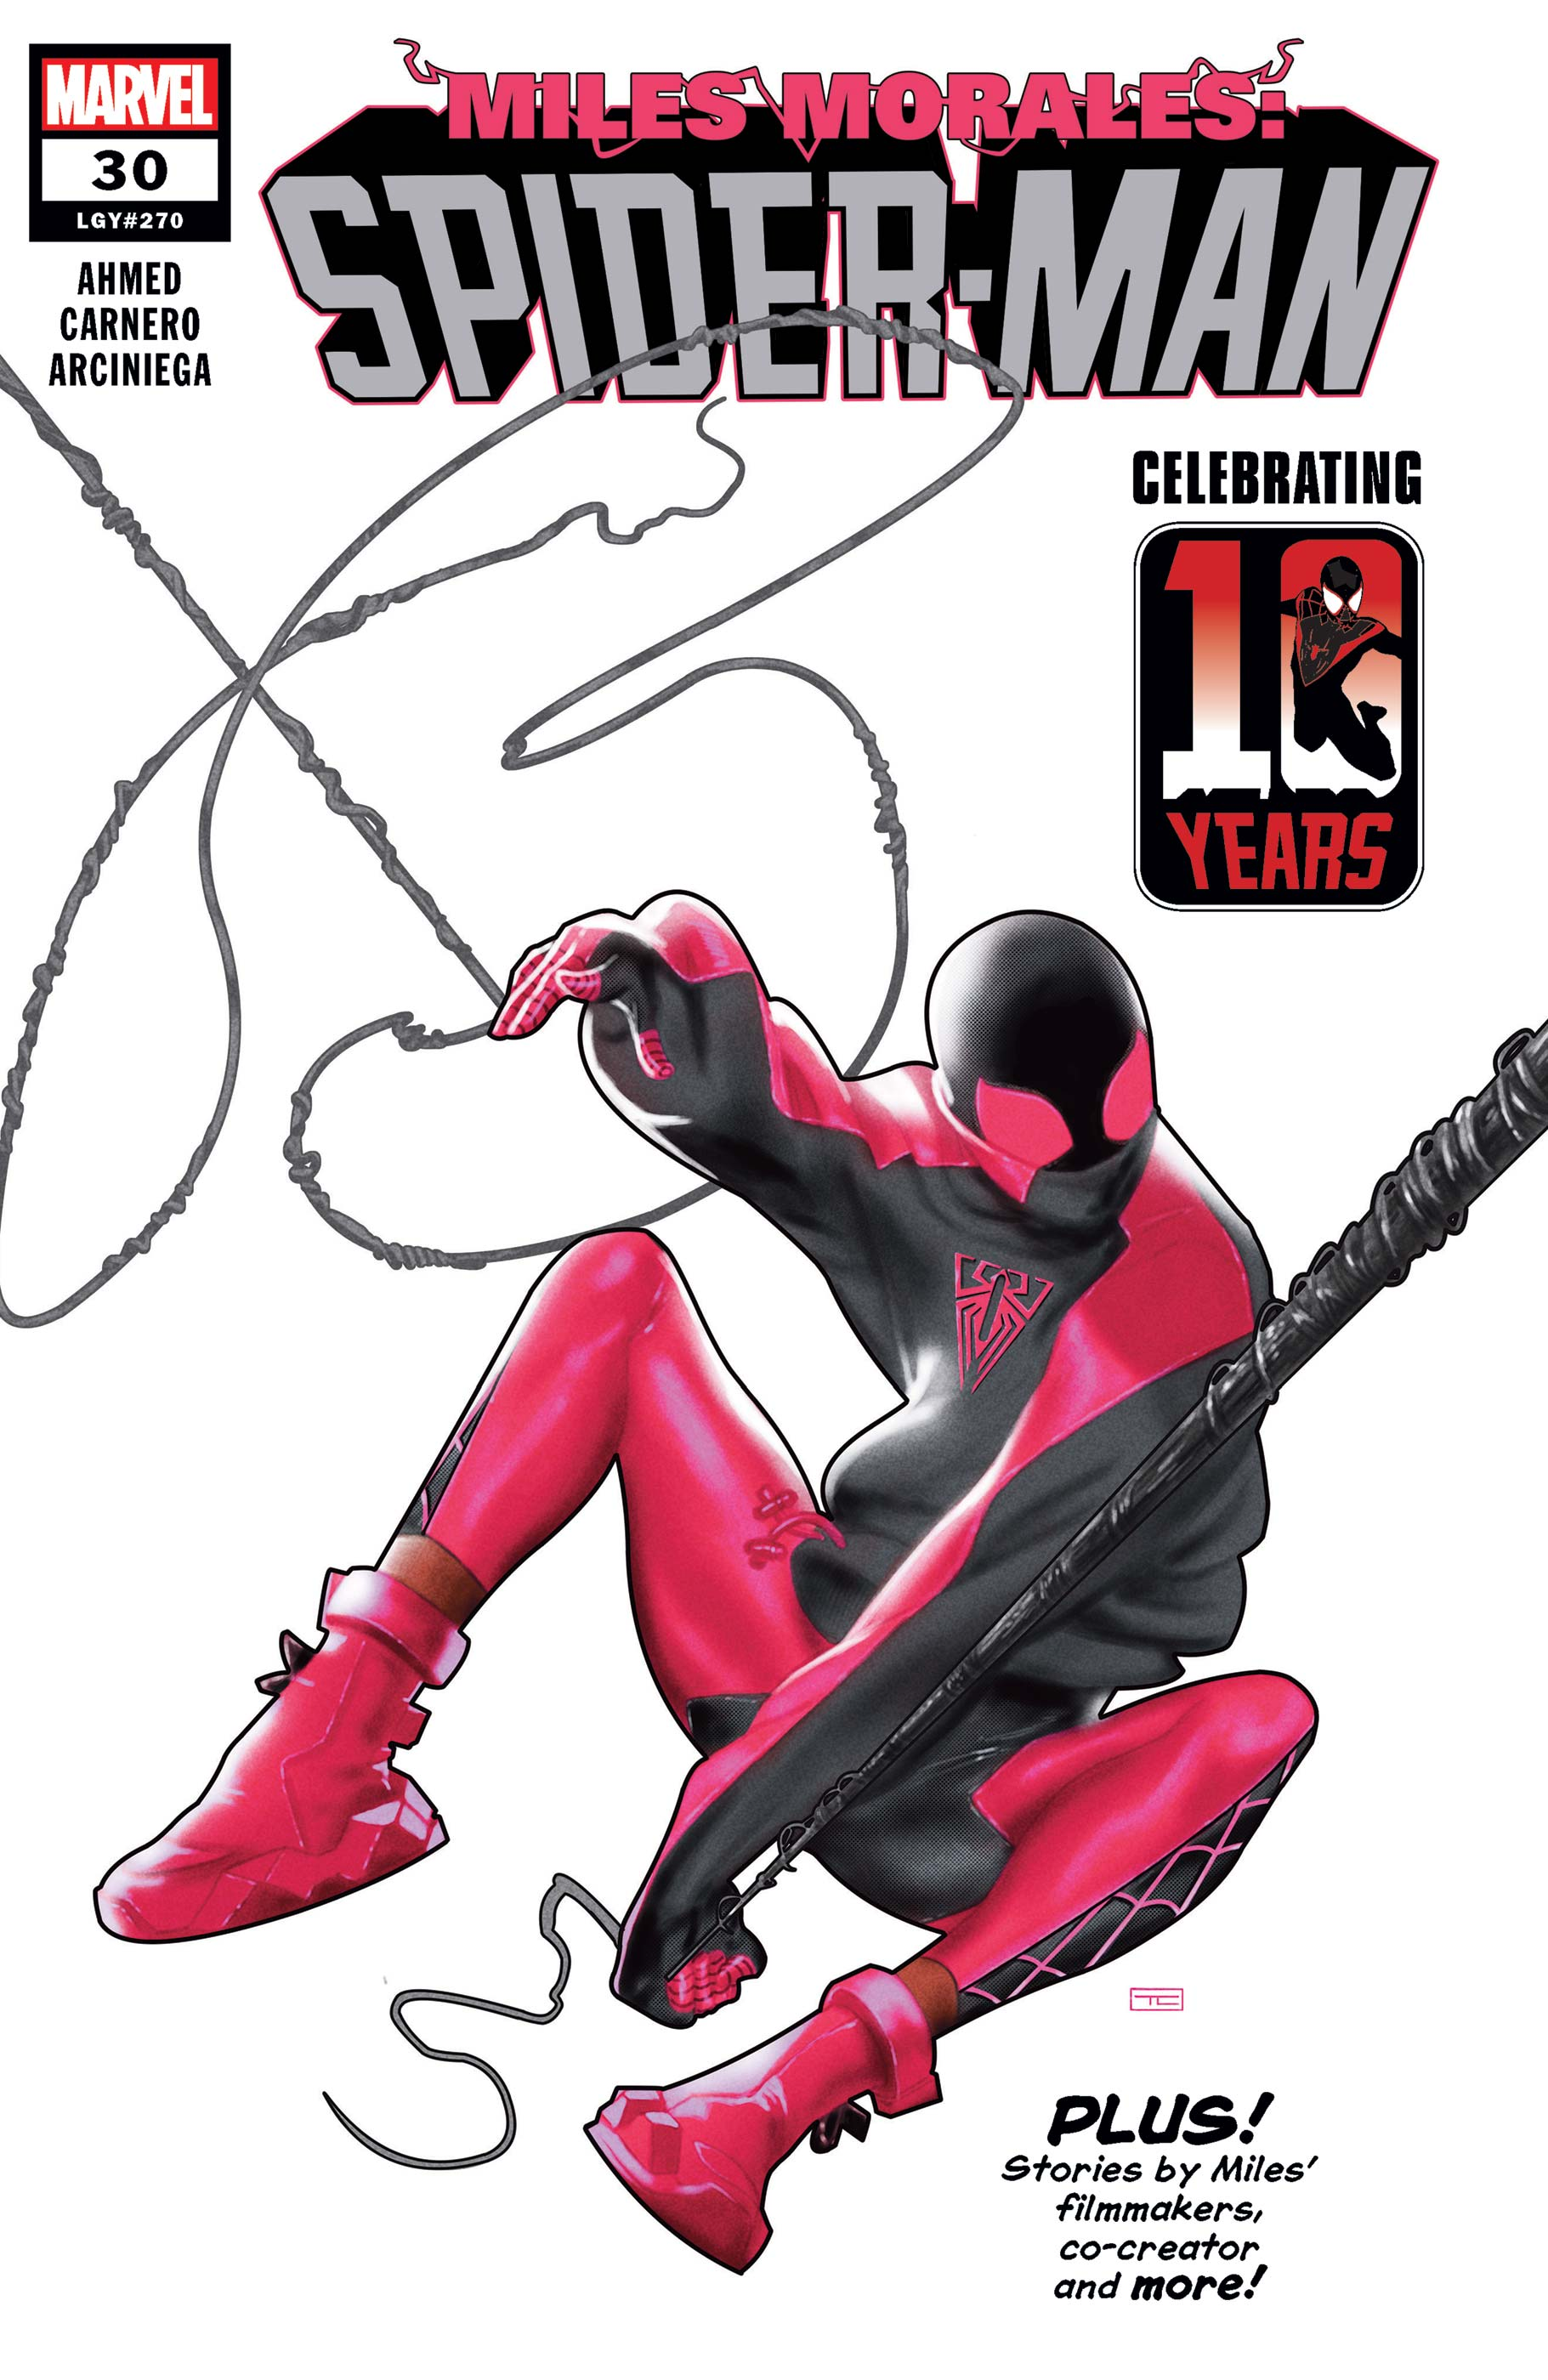 Miles Morales: Spider-Man (2018) #30